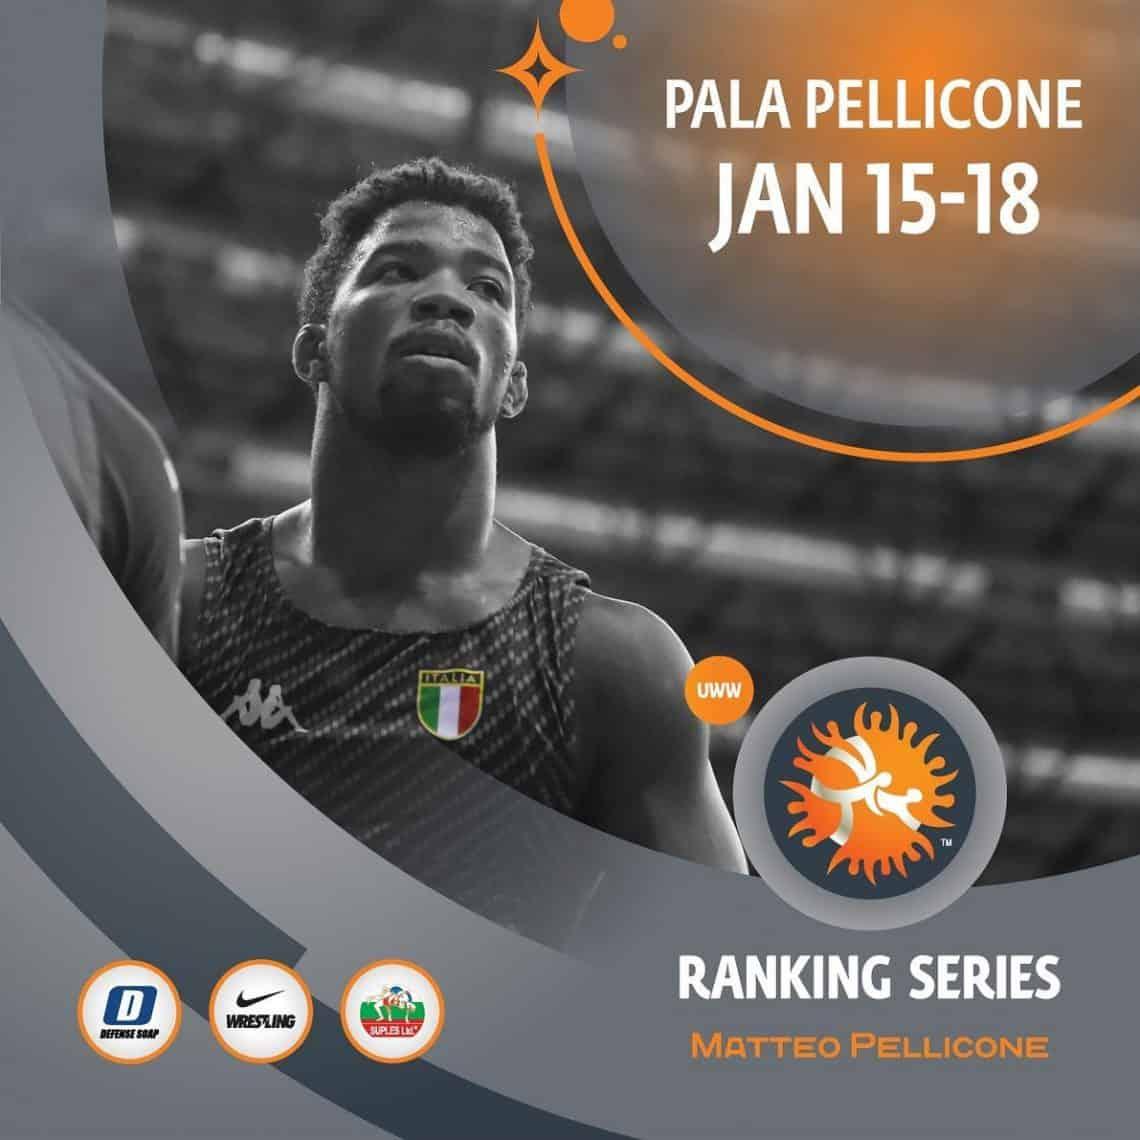 2020 Ranking Series Wrestiling Matteo Pellicone - Roma 1